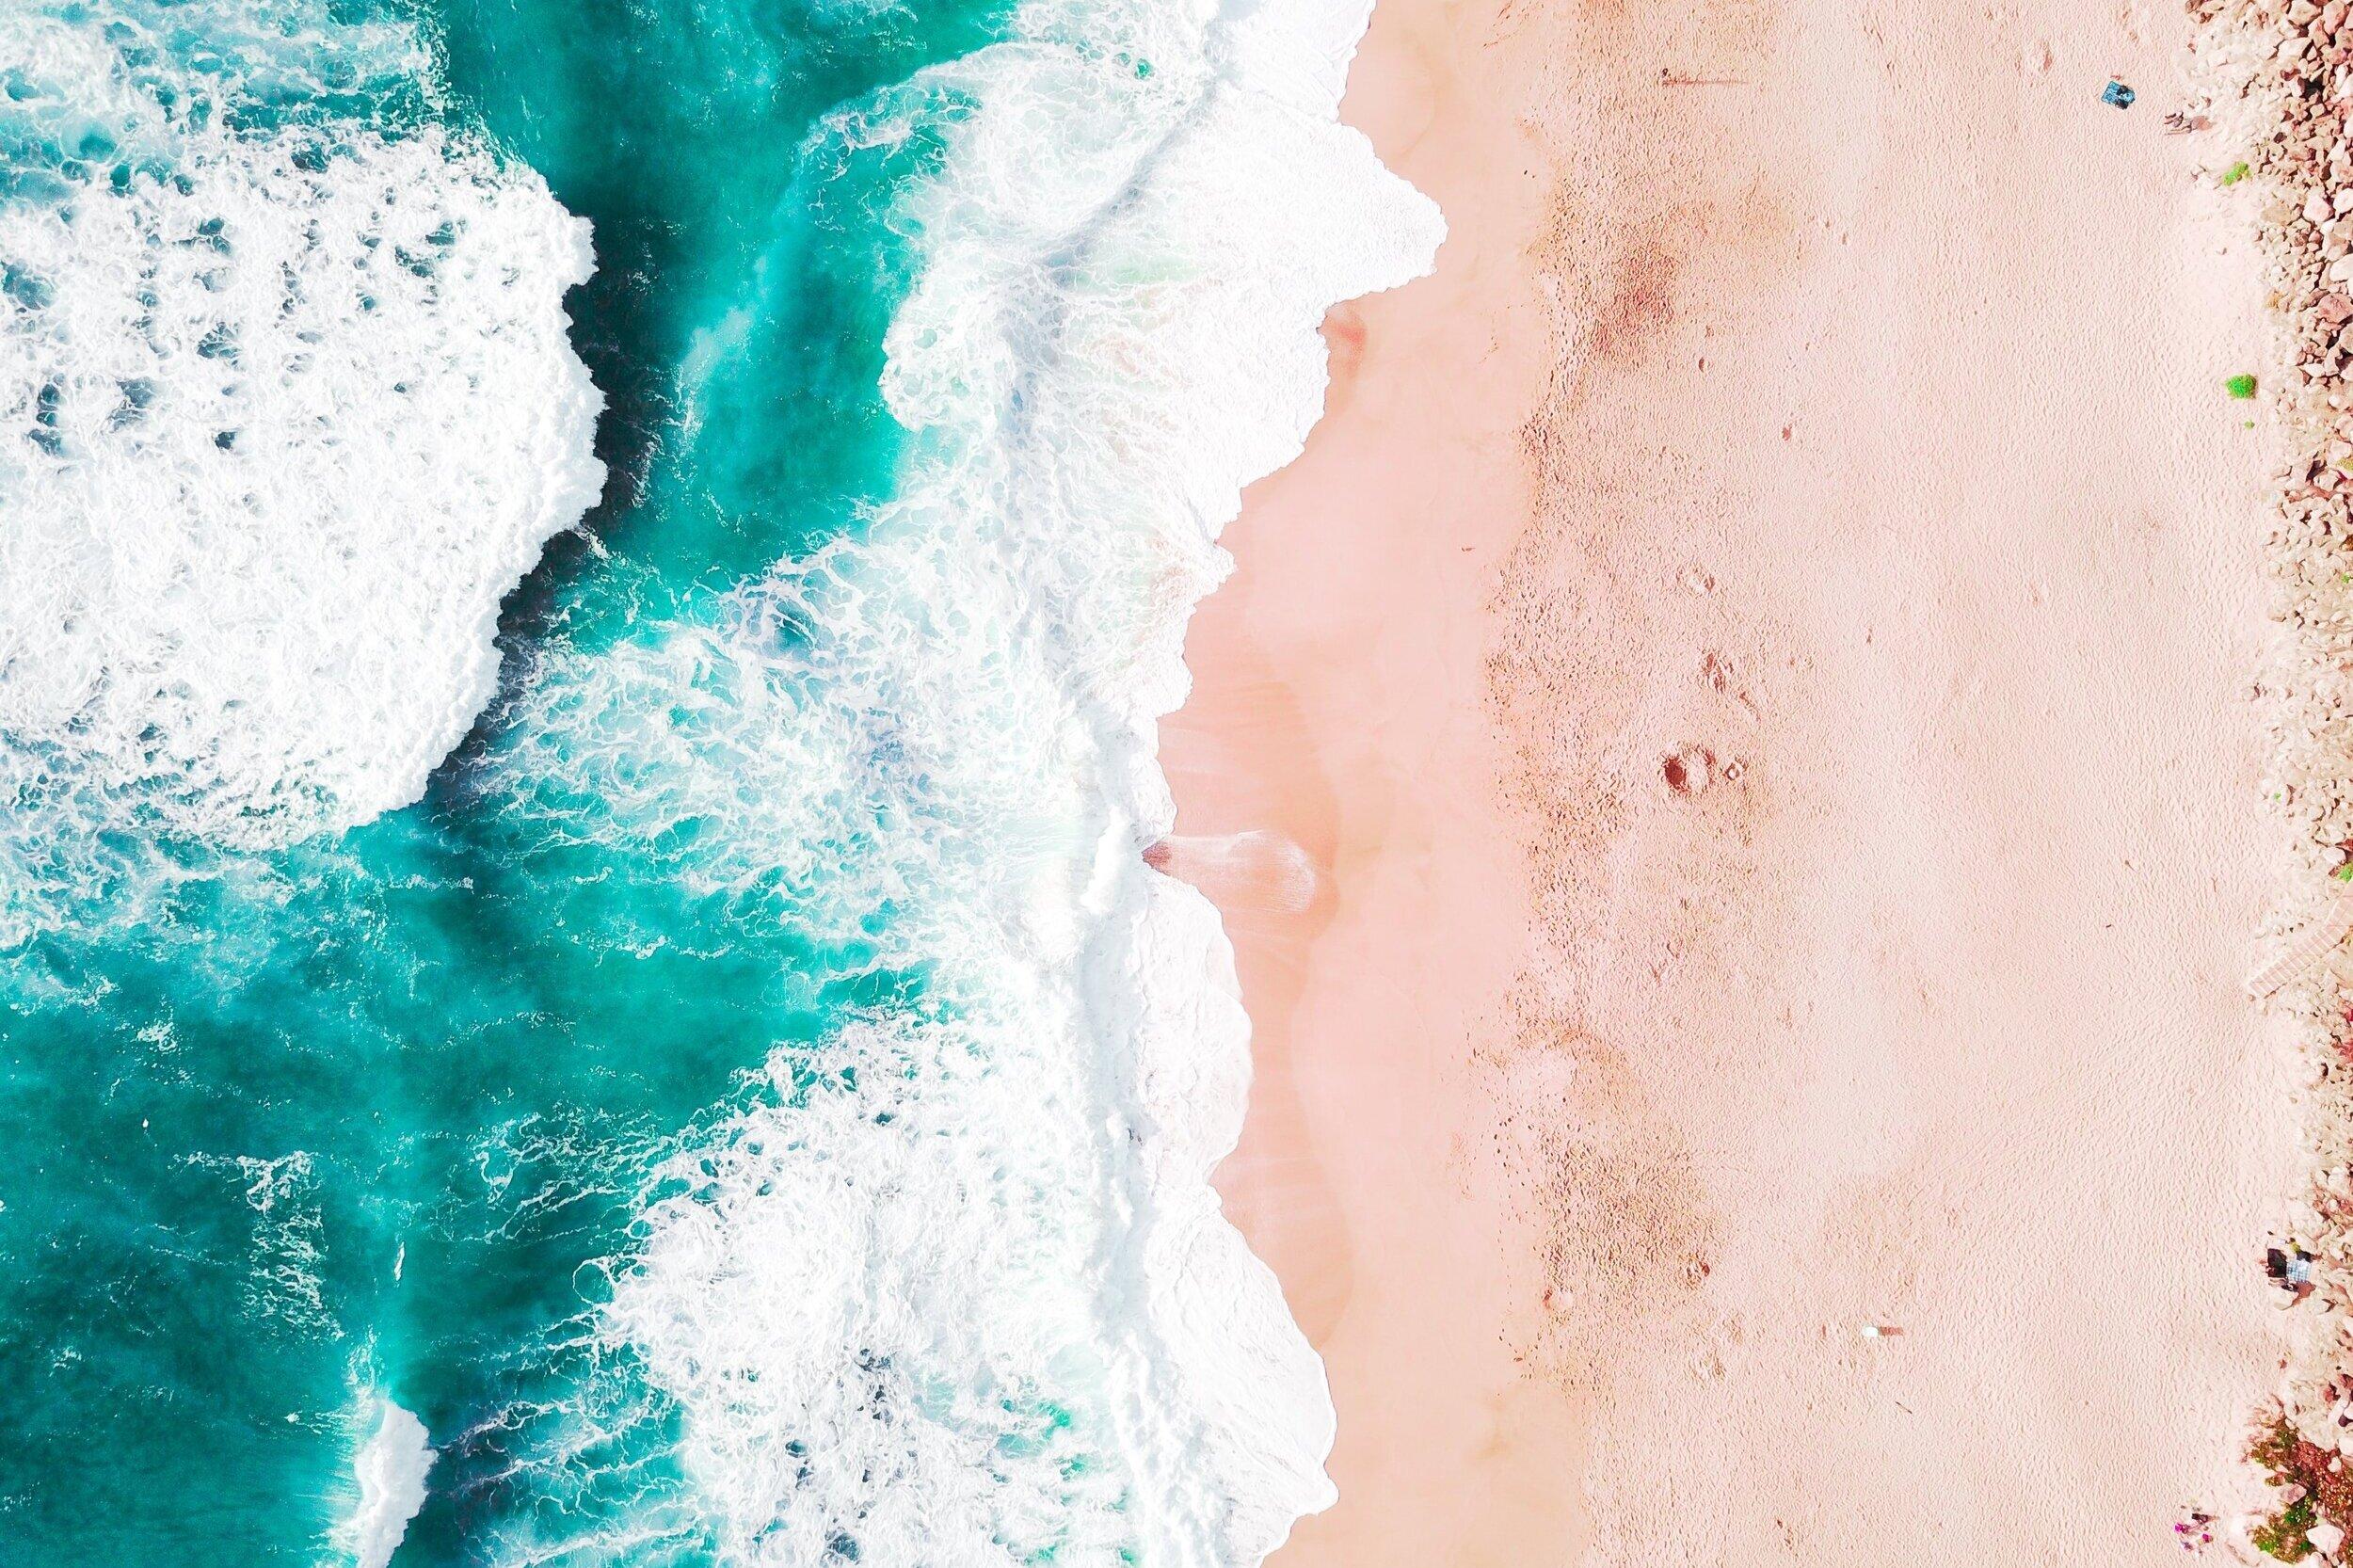 Baja California Sur, Mexico - Getaway — February 14th - 17th, 2020